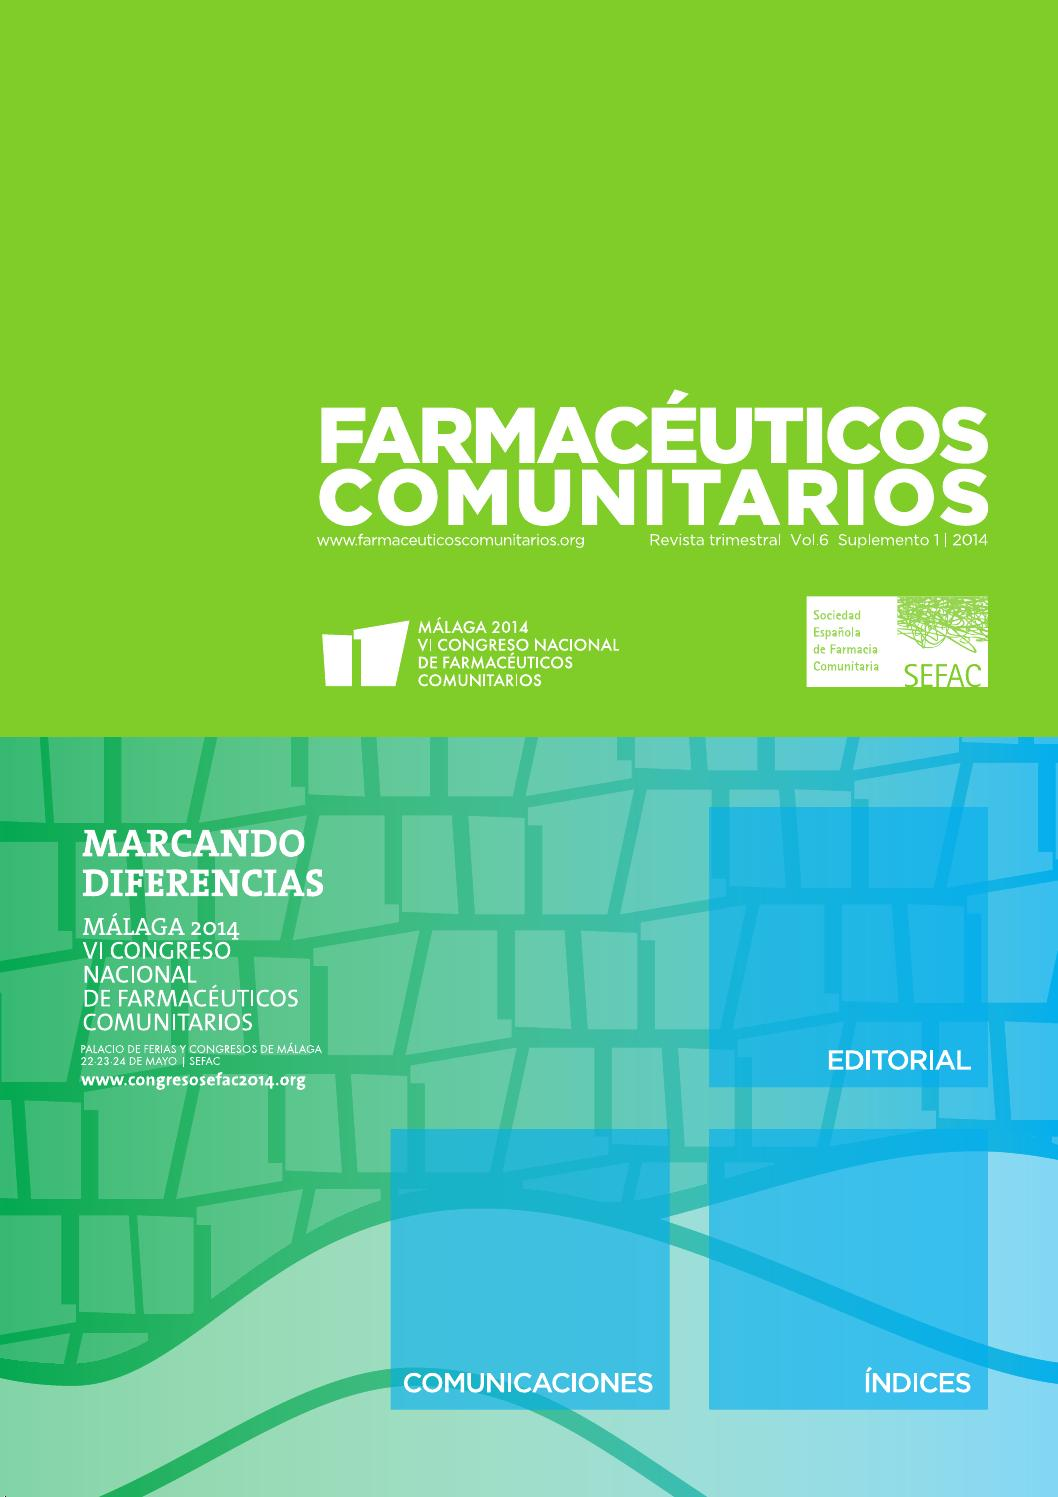 Farmaceuticos Comunitarios 2014 Volumen 6 Suplemento 1 By Canalsefac Issuu